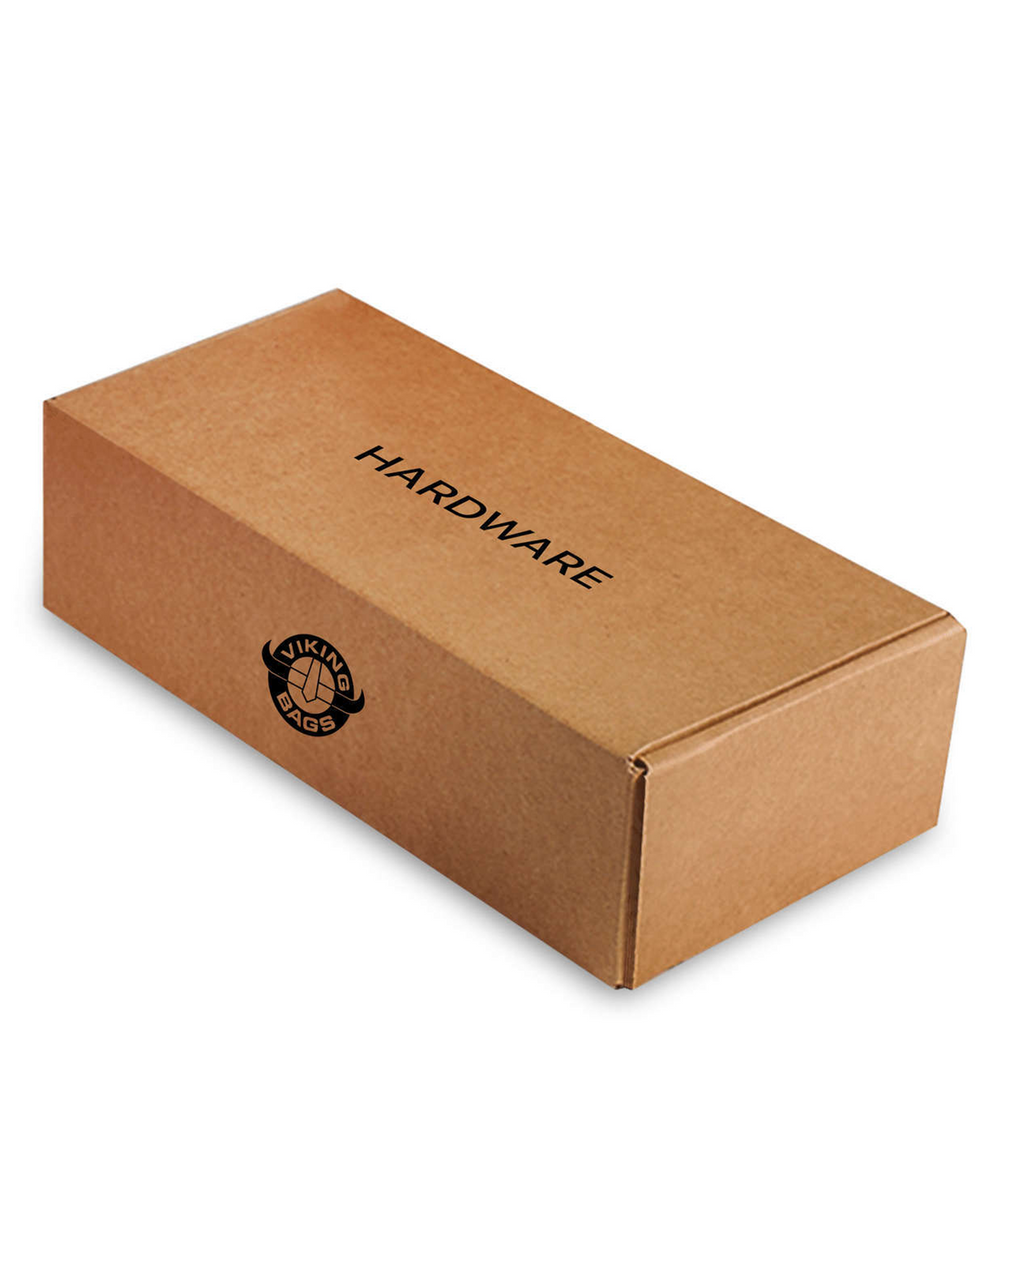 Honda VTX 1800 S Viking Lamellar Slanted Leather Covered Motorcycle Hard Saddlebags box